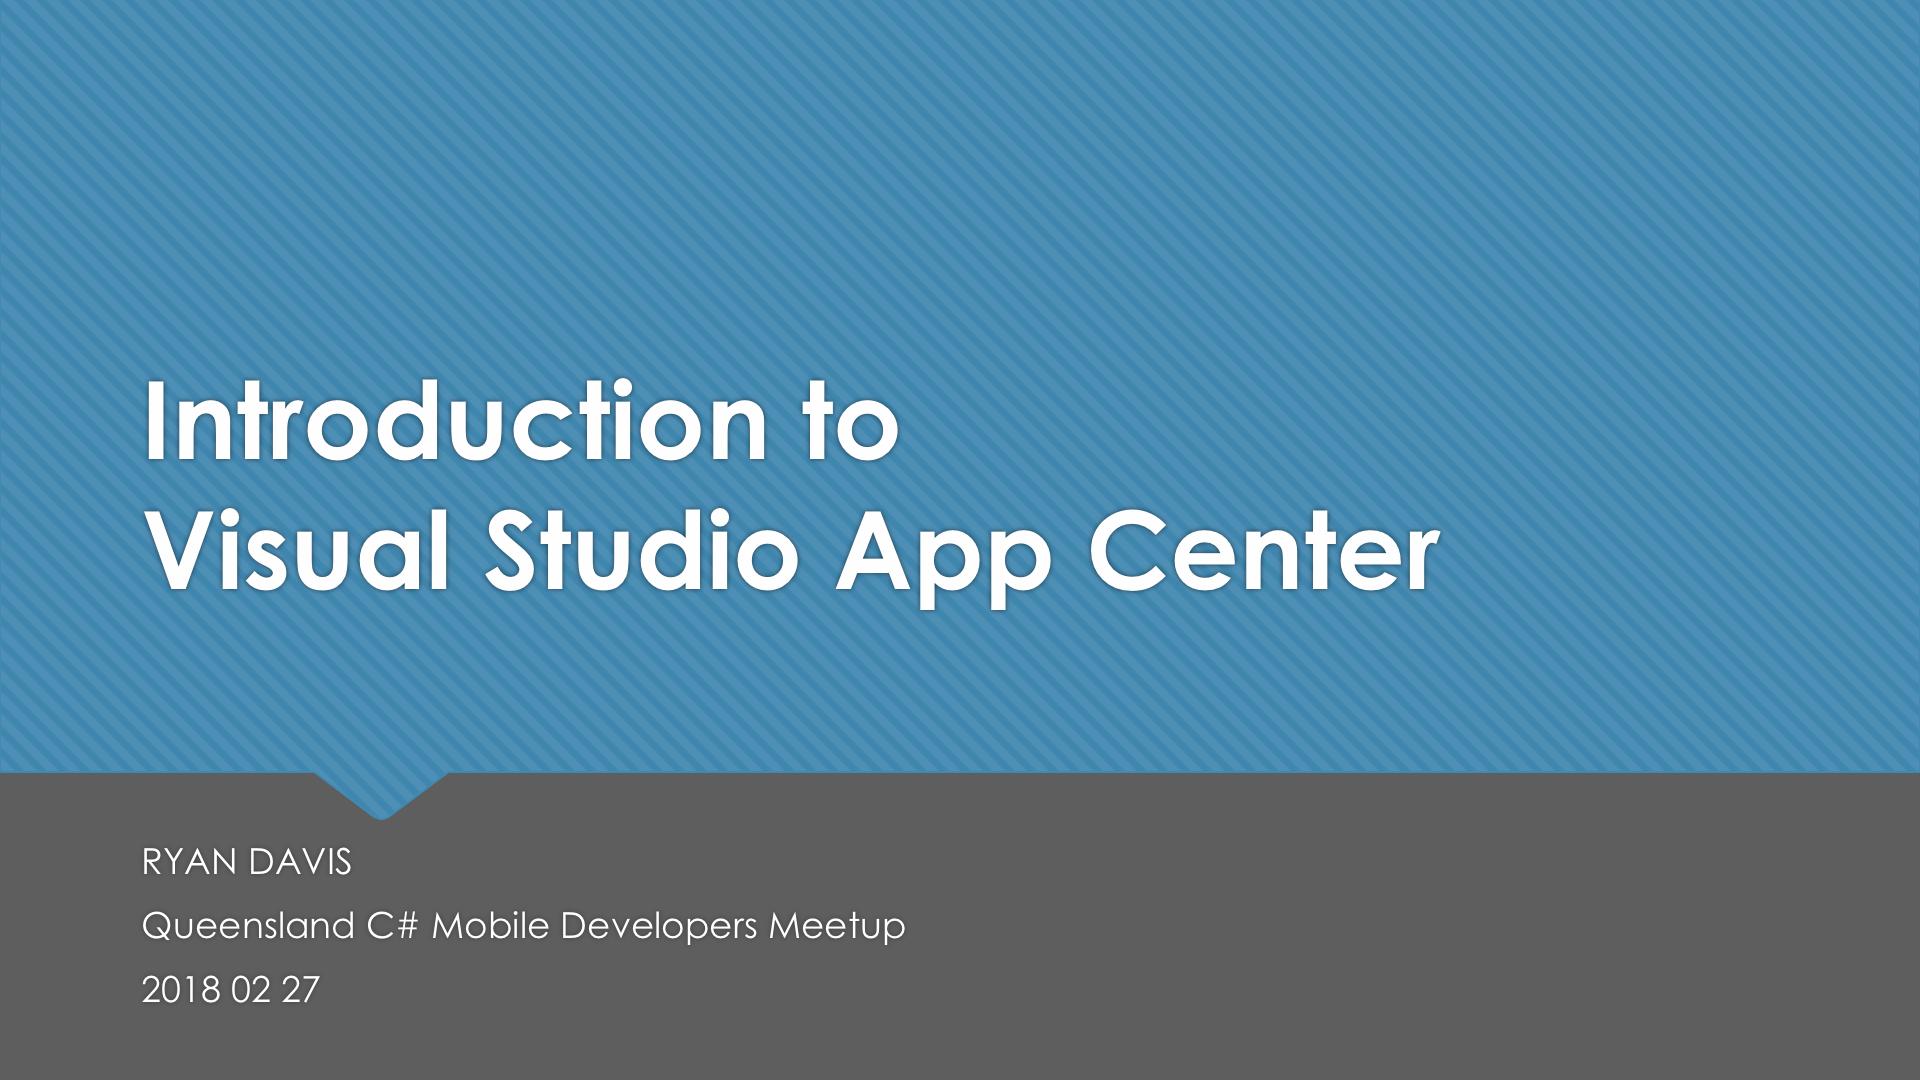 Introduction to Visual Studio App Center